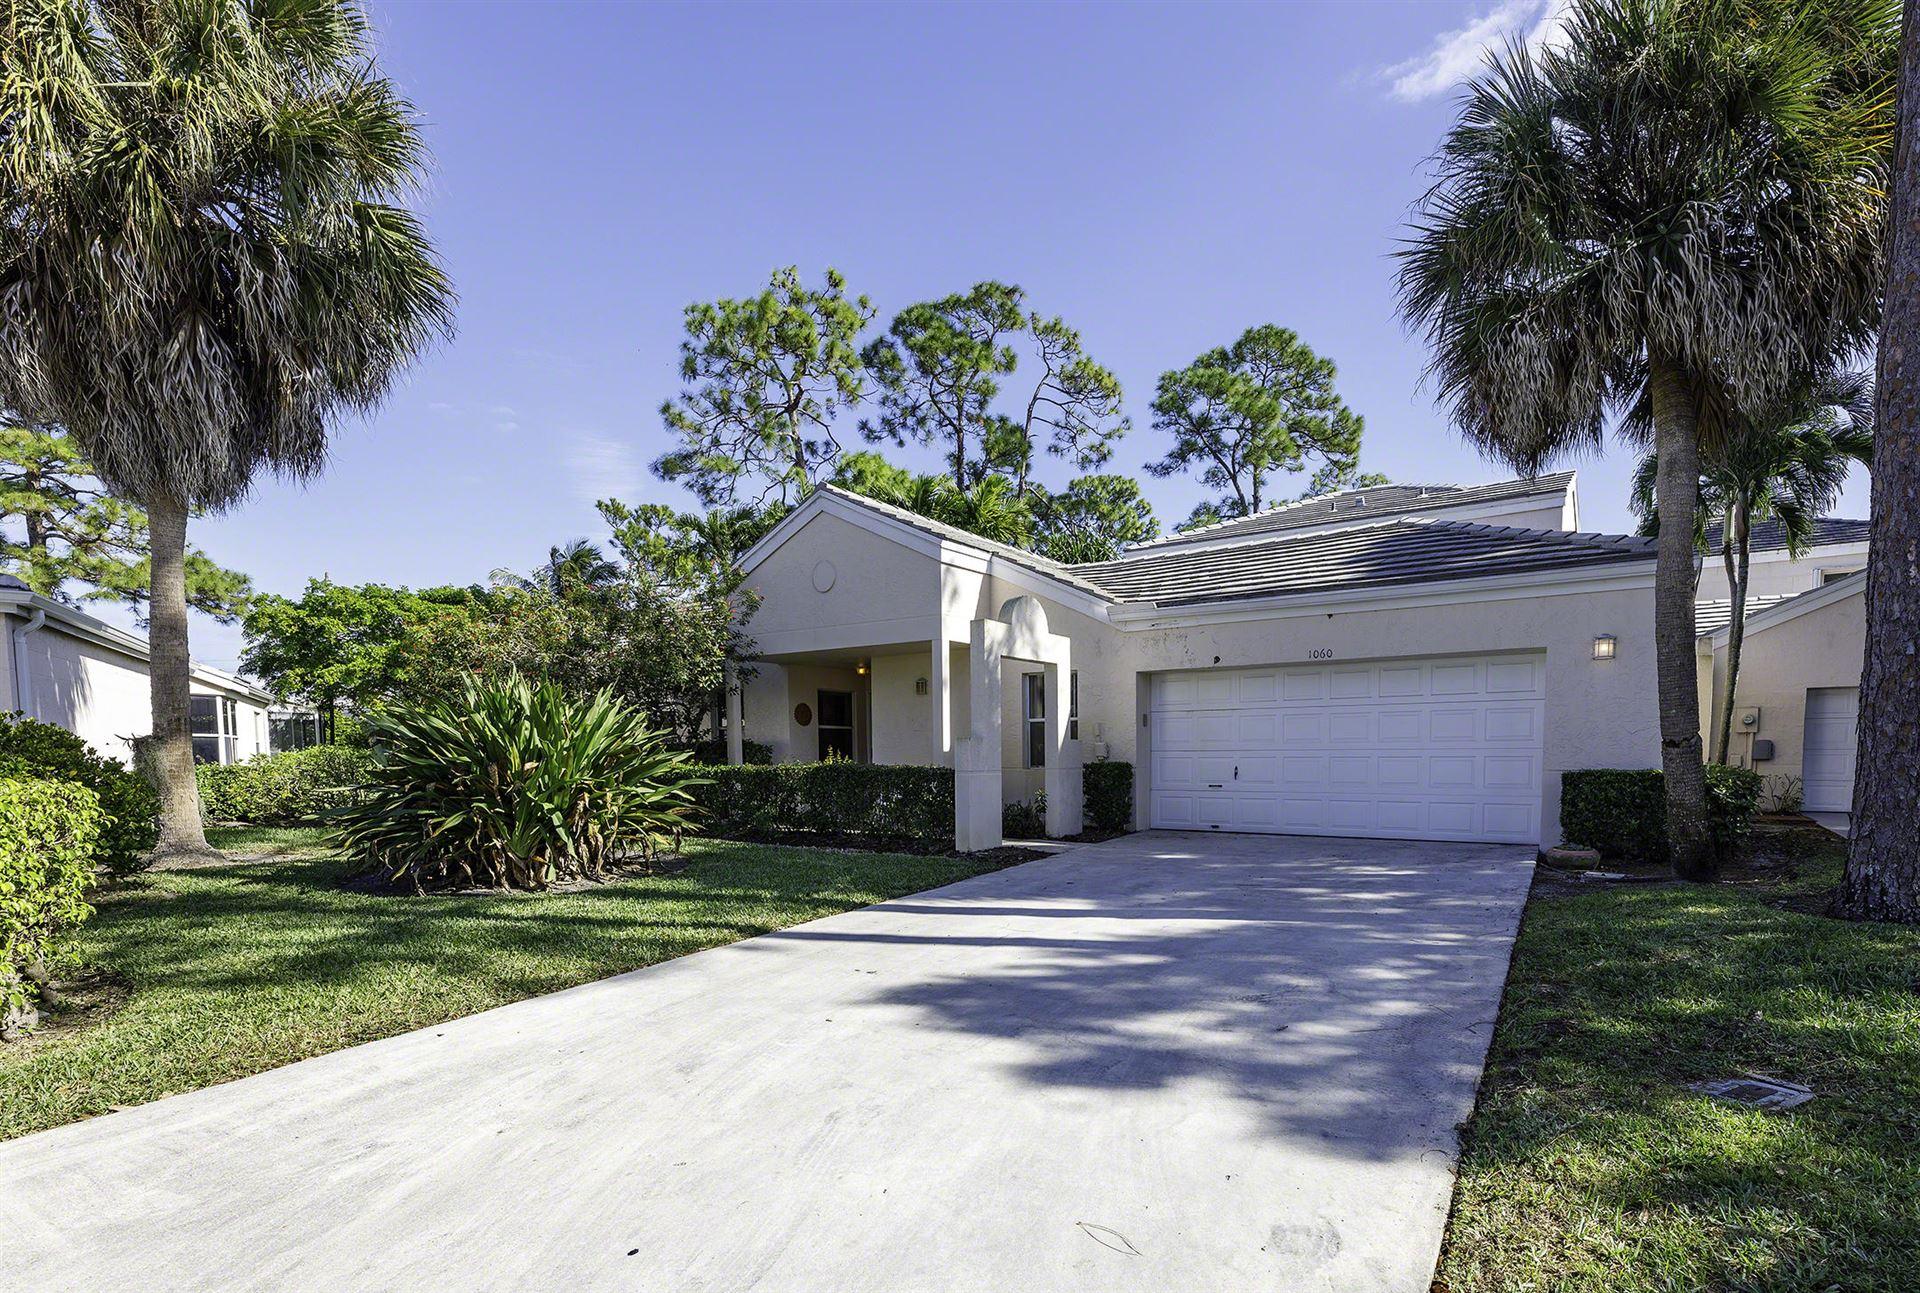 Photo of 1060 Island Manor Drive, Greenacres, FL 33413 (MLS # RX-10679408)